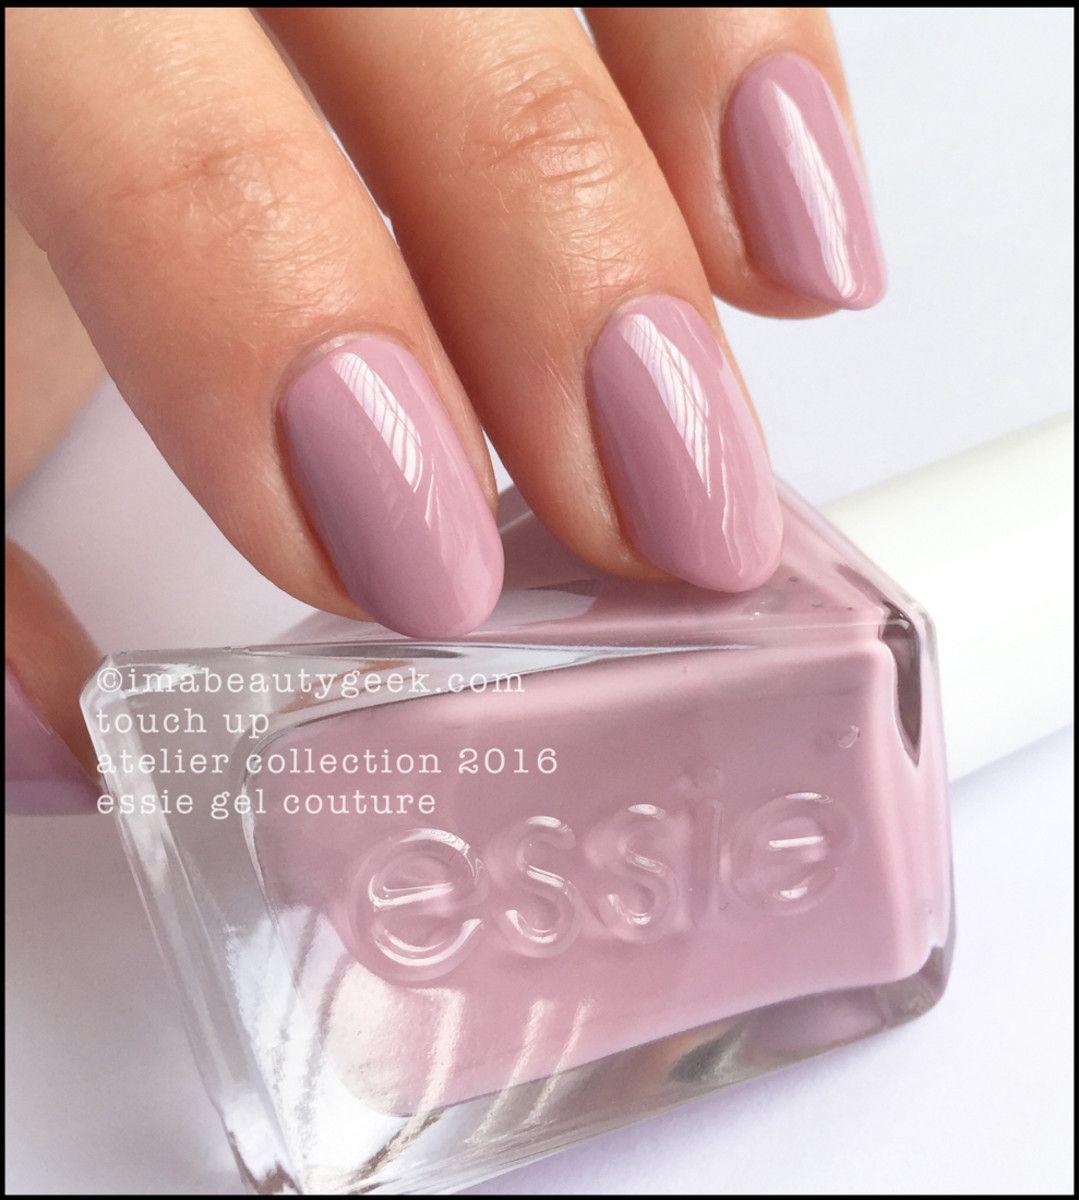 Essie Touch Up_Essie Gel Couture Swatches Review 2016 | Essie nail ...